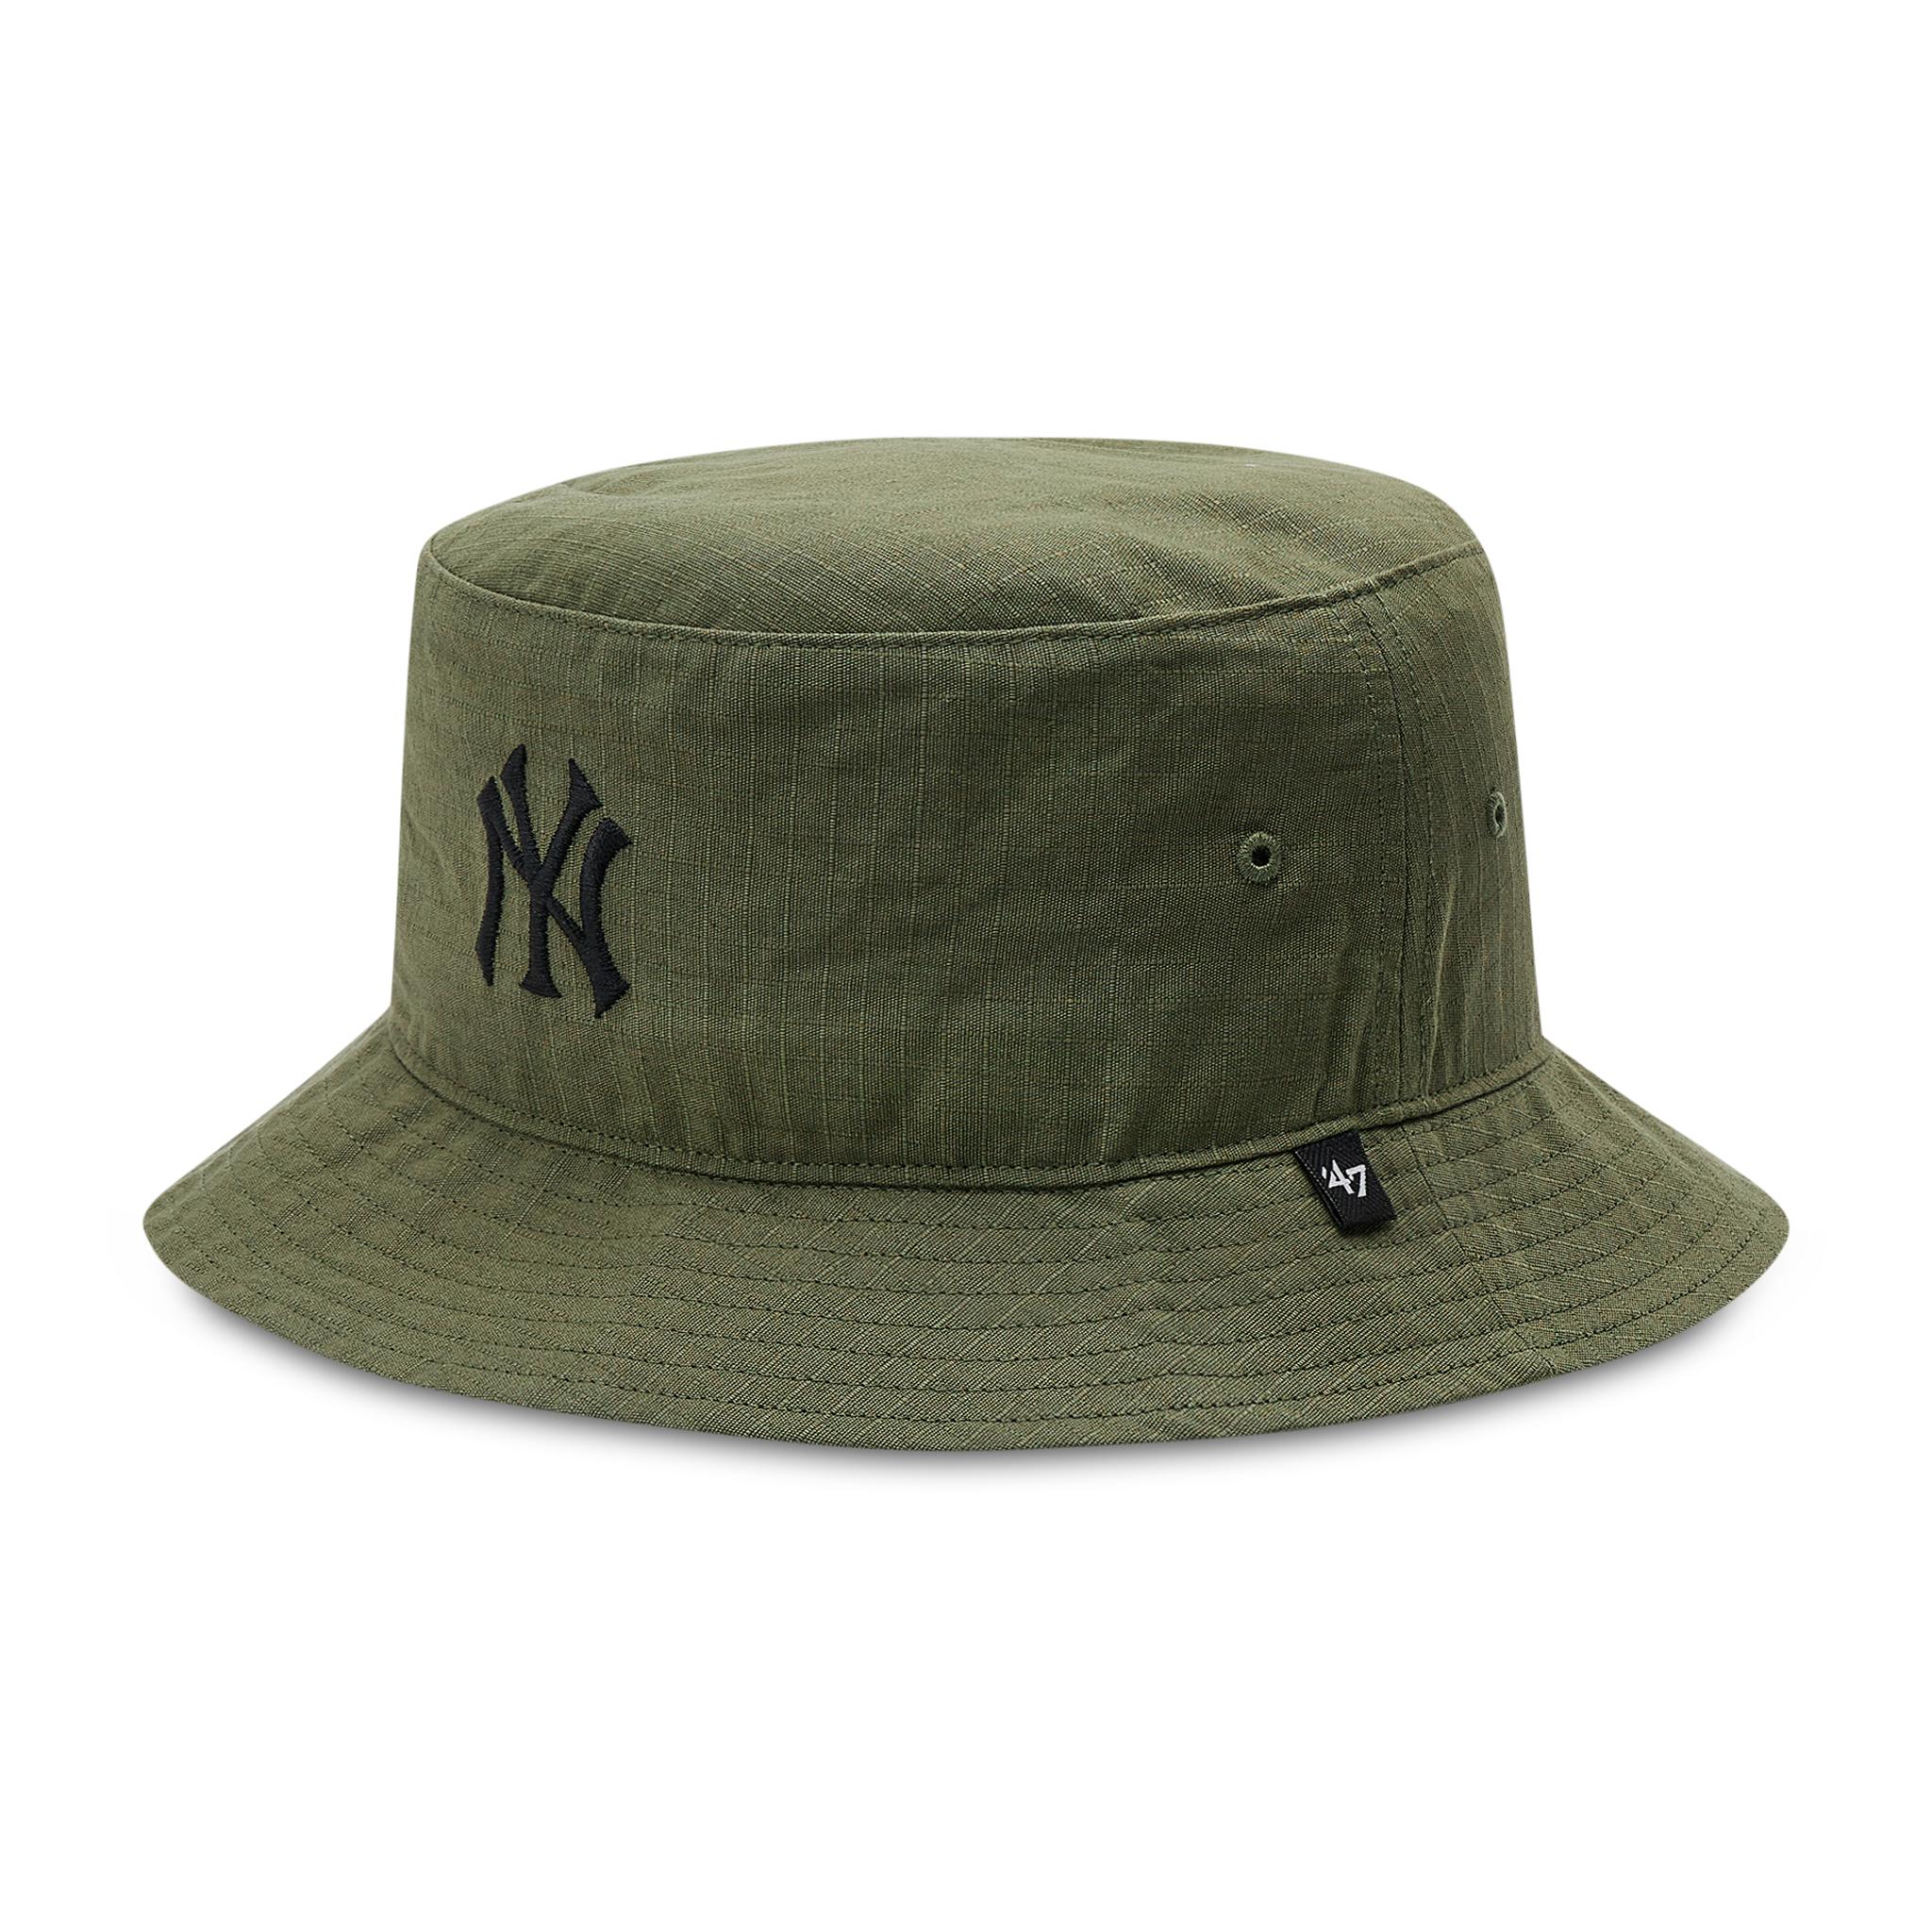 Image of Bucket Hat 47 BRAND - New York Yankees Grid Lock B-GRDLB17RCF-XC Conopy